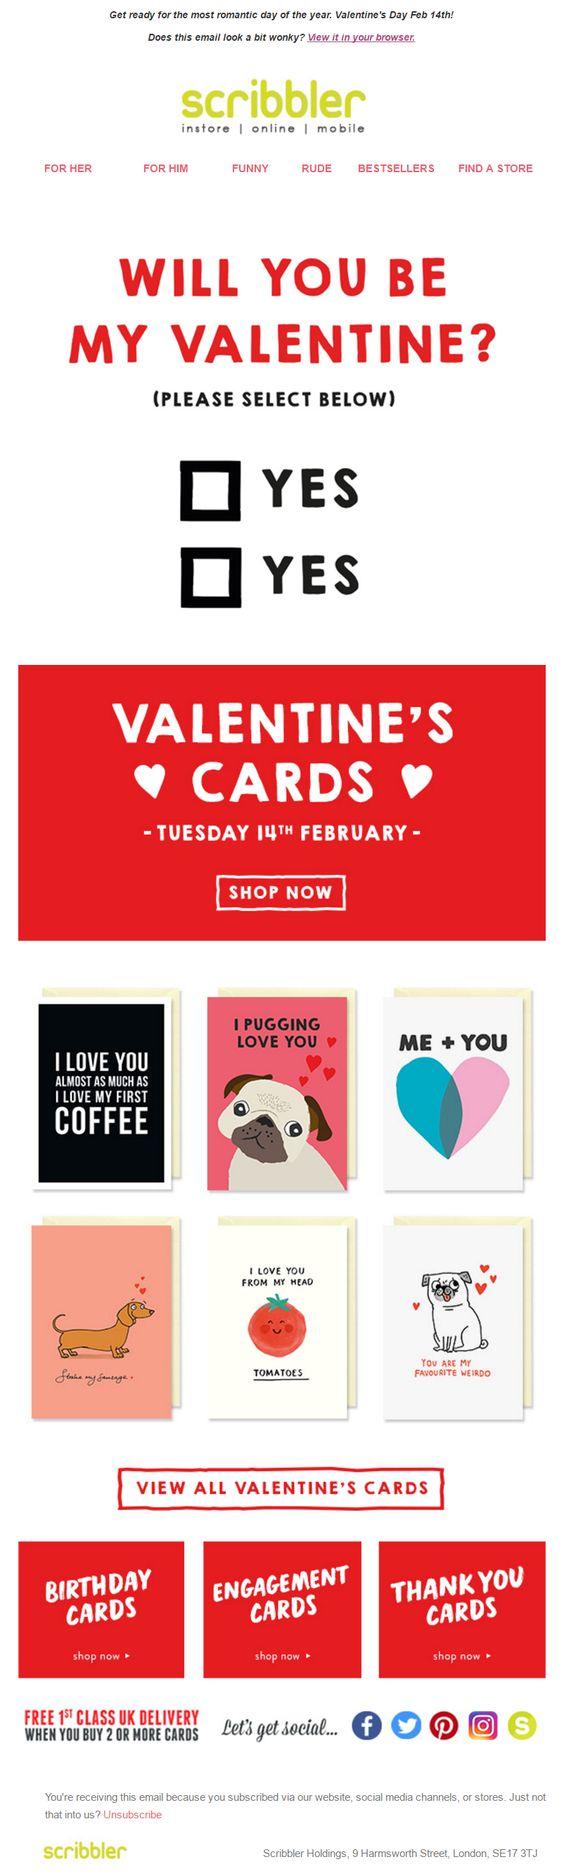 "Scribbler ""will you be my valentine?"" Valentine email design"